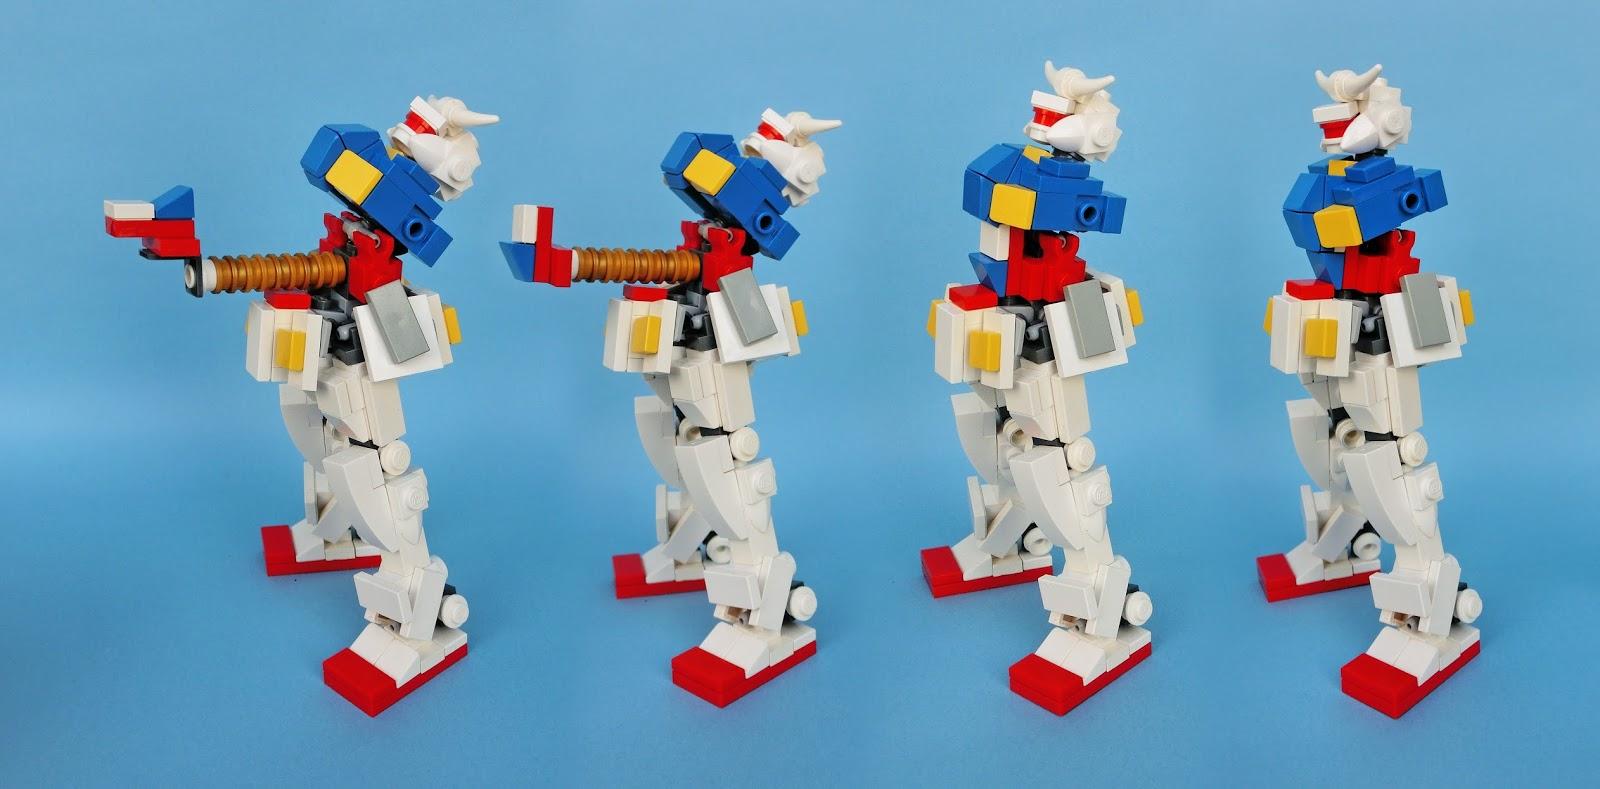 LEGO Build: RX-78-2 Gundam - Gundam Kits Collection News